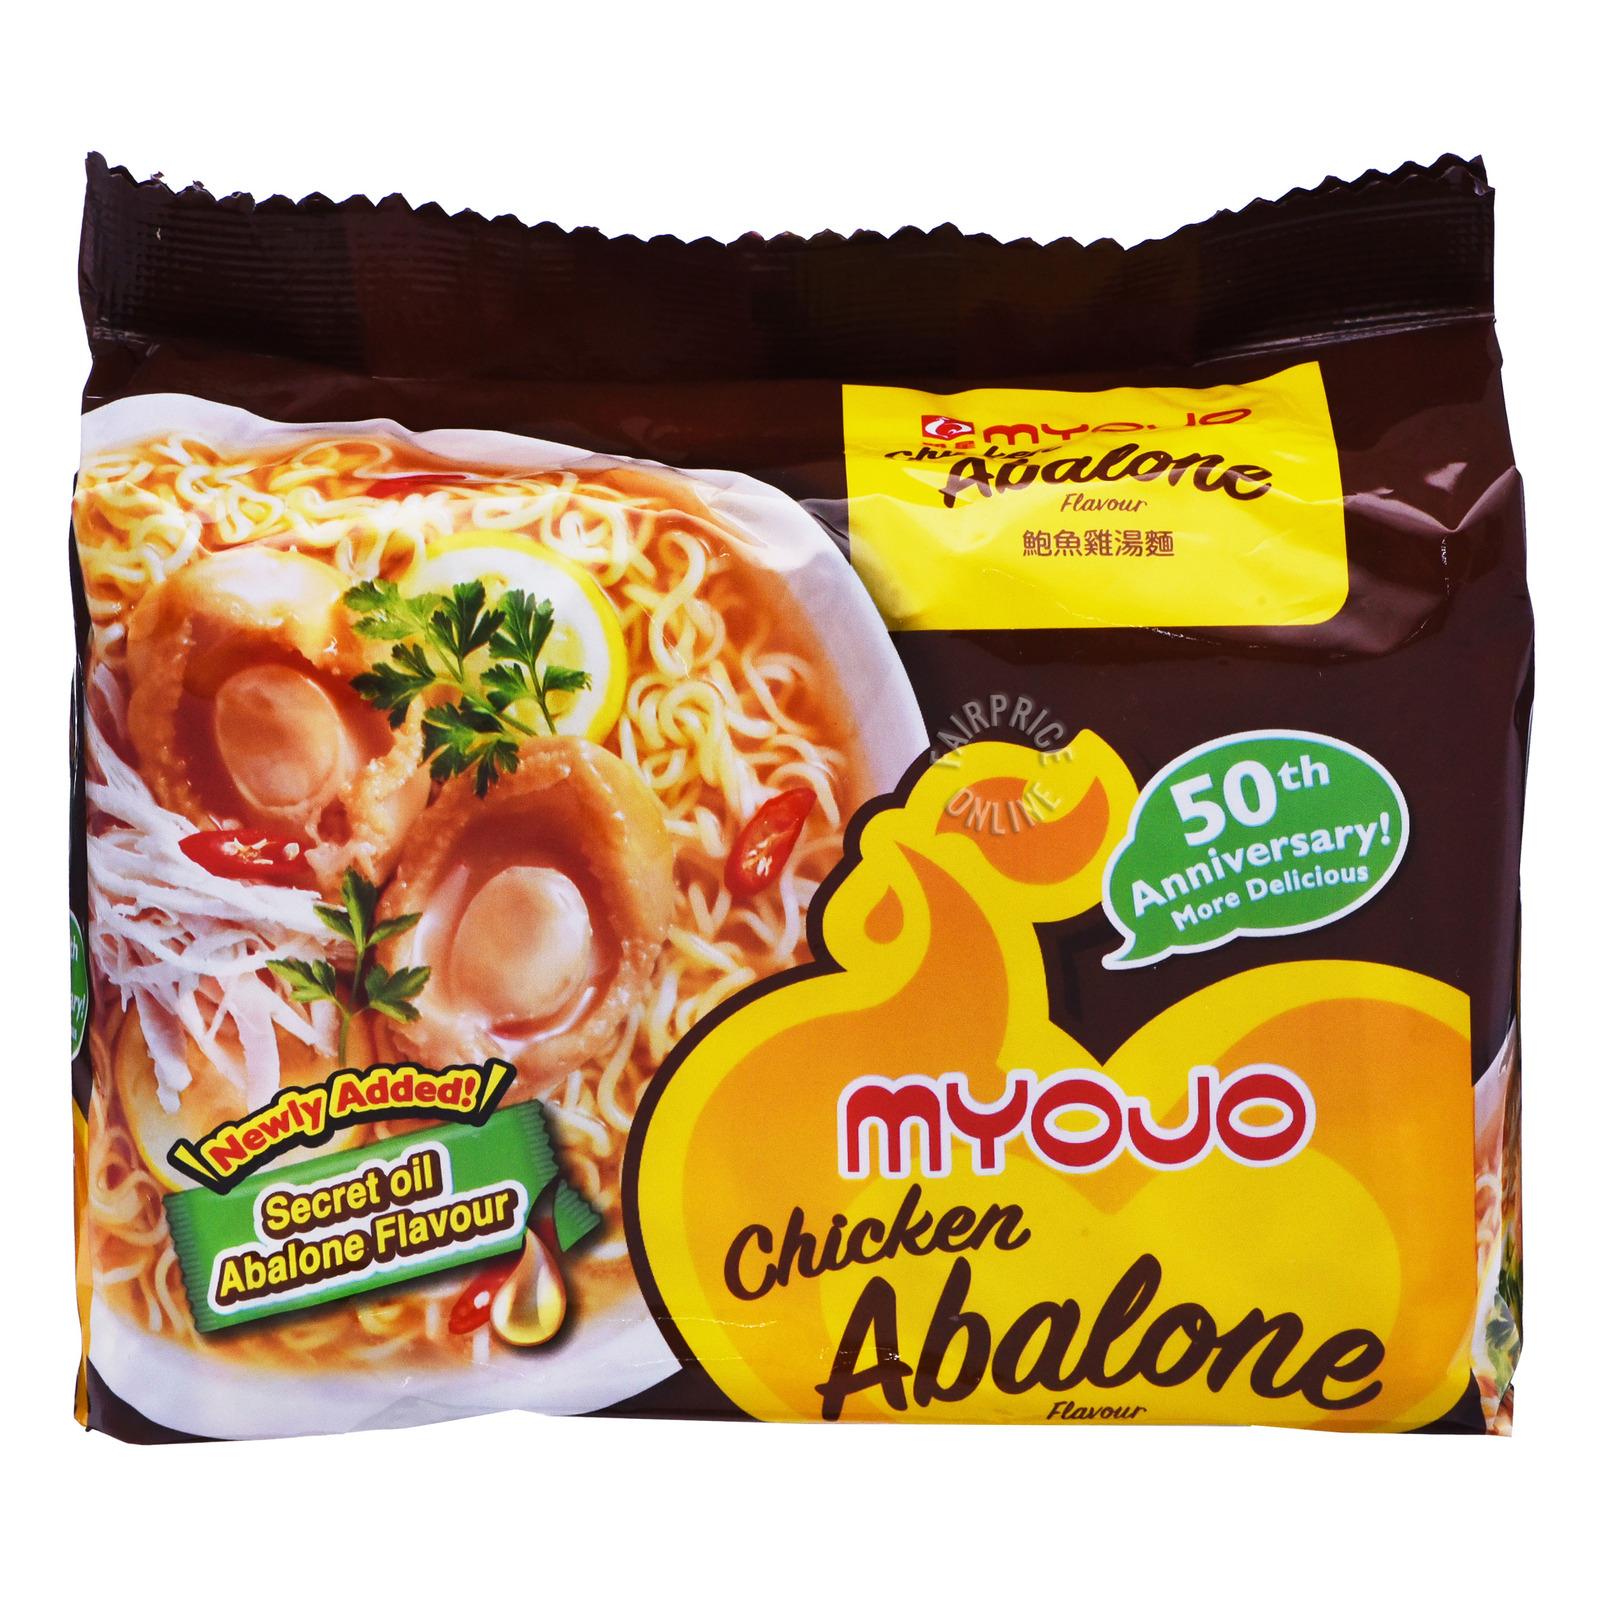 Myojo Instant Noodles - Chicken Abalone